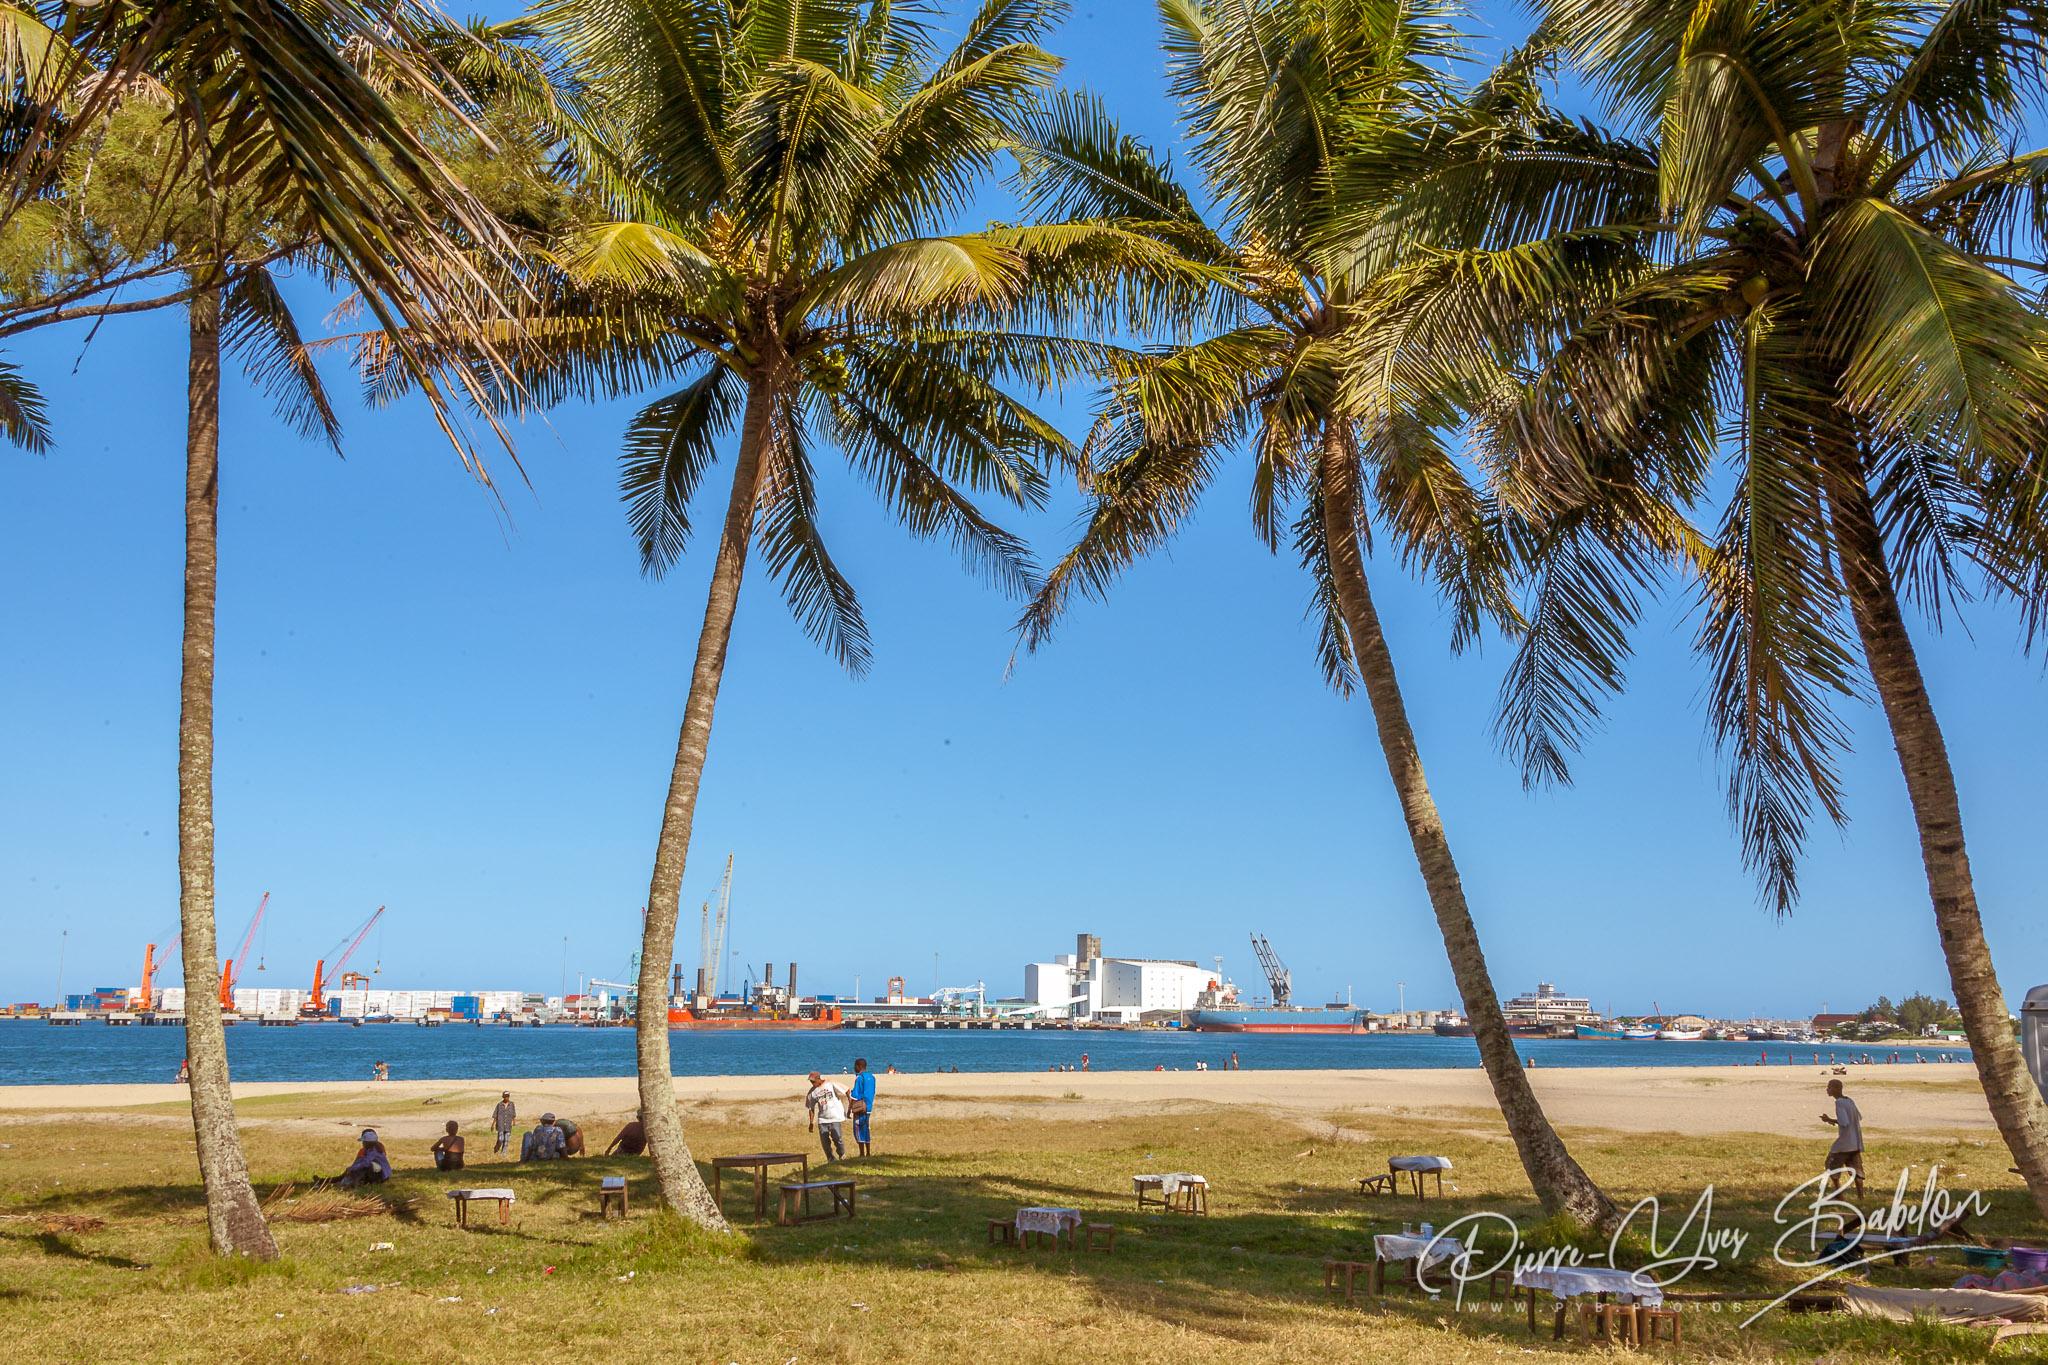 Picnic on the beach of Toamasina